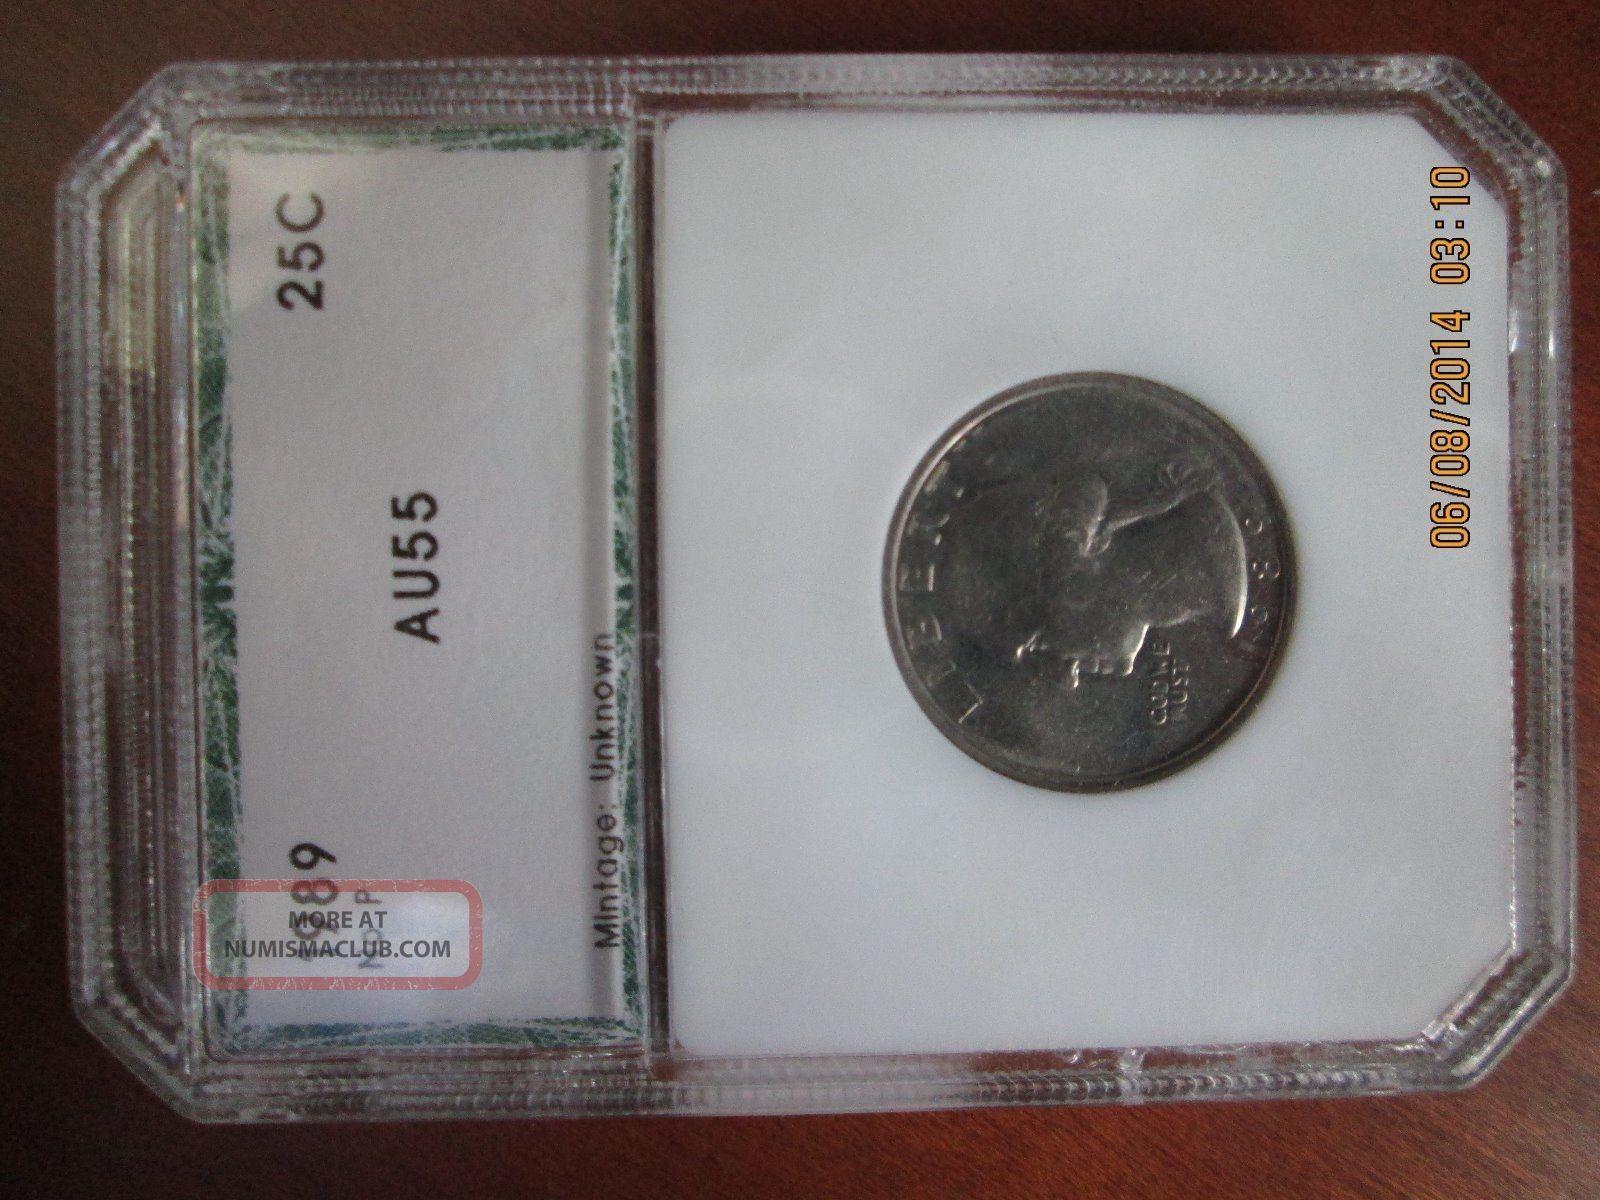 1989 Washington Quarter - No Mintmark Error - Raw